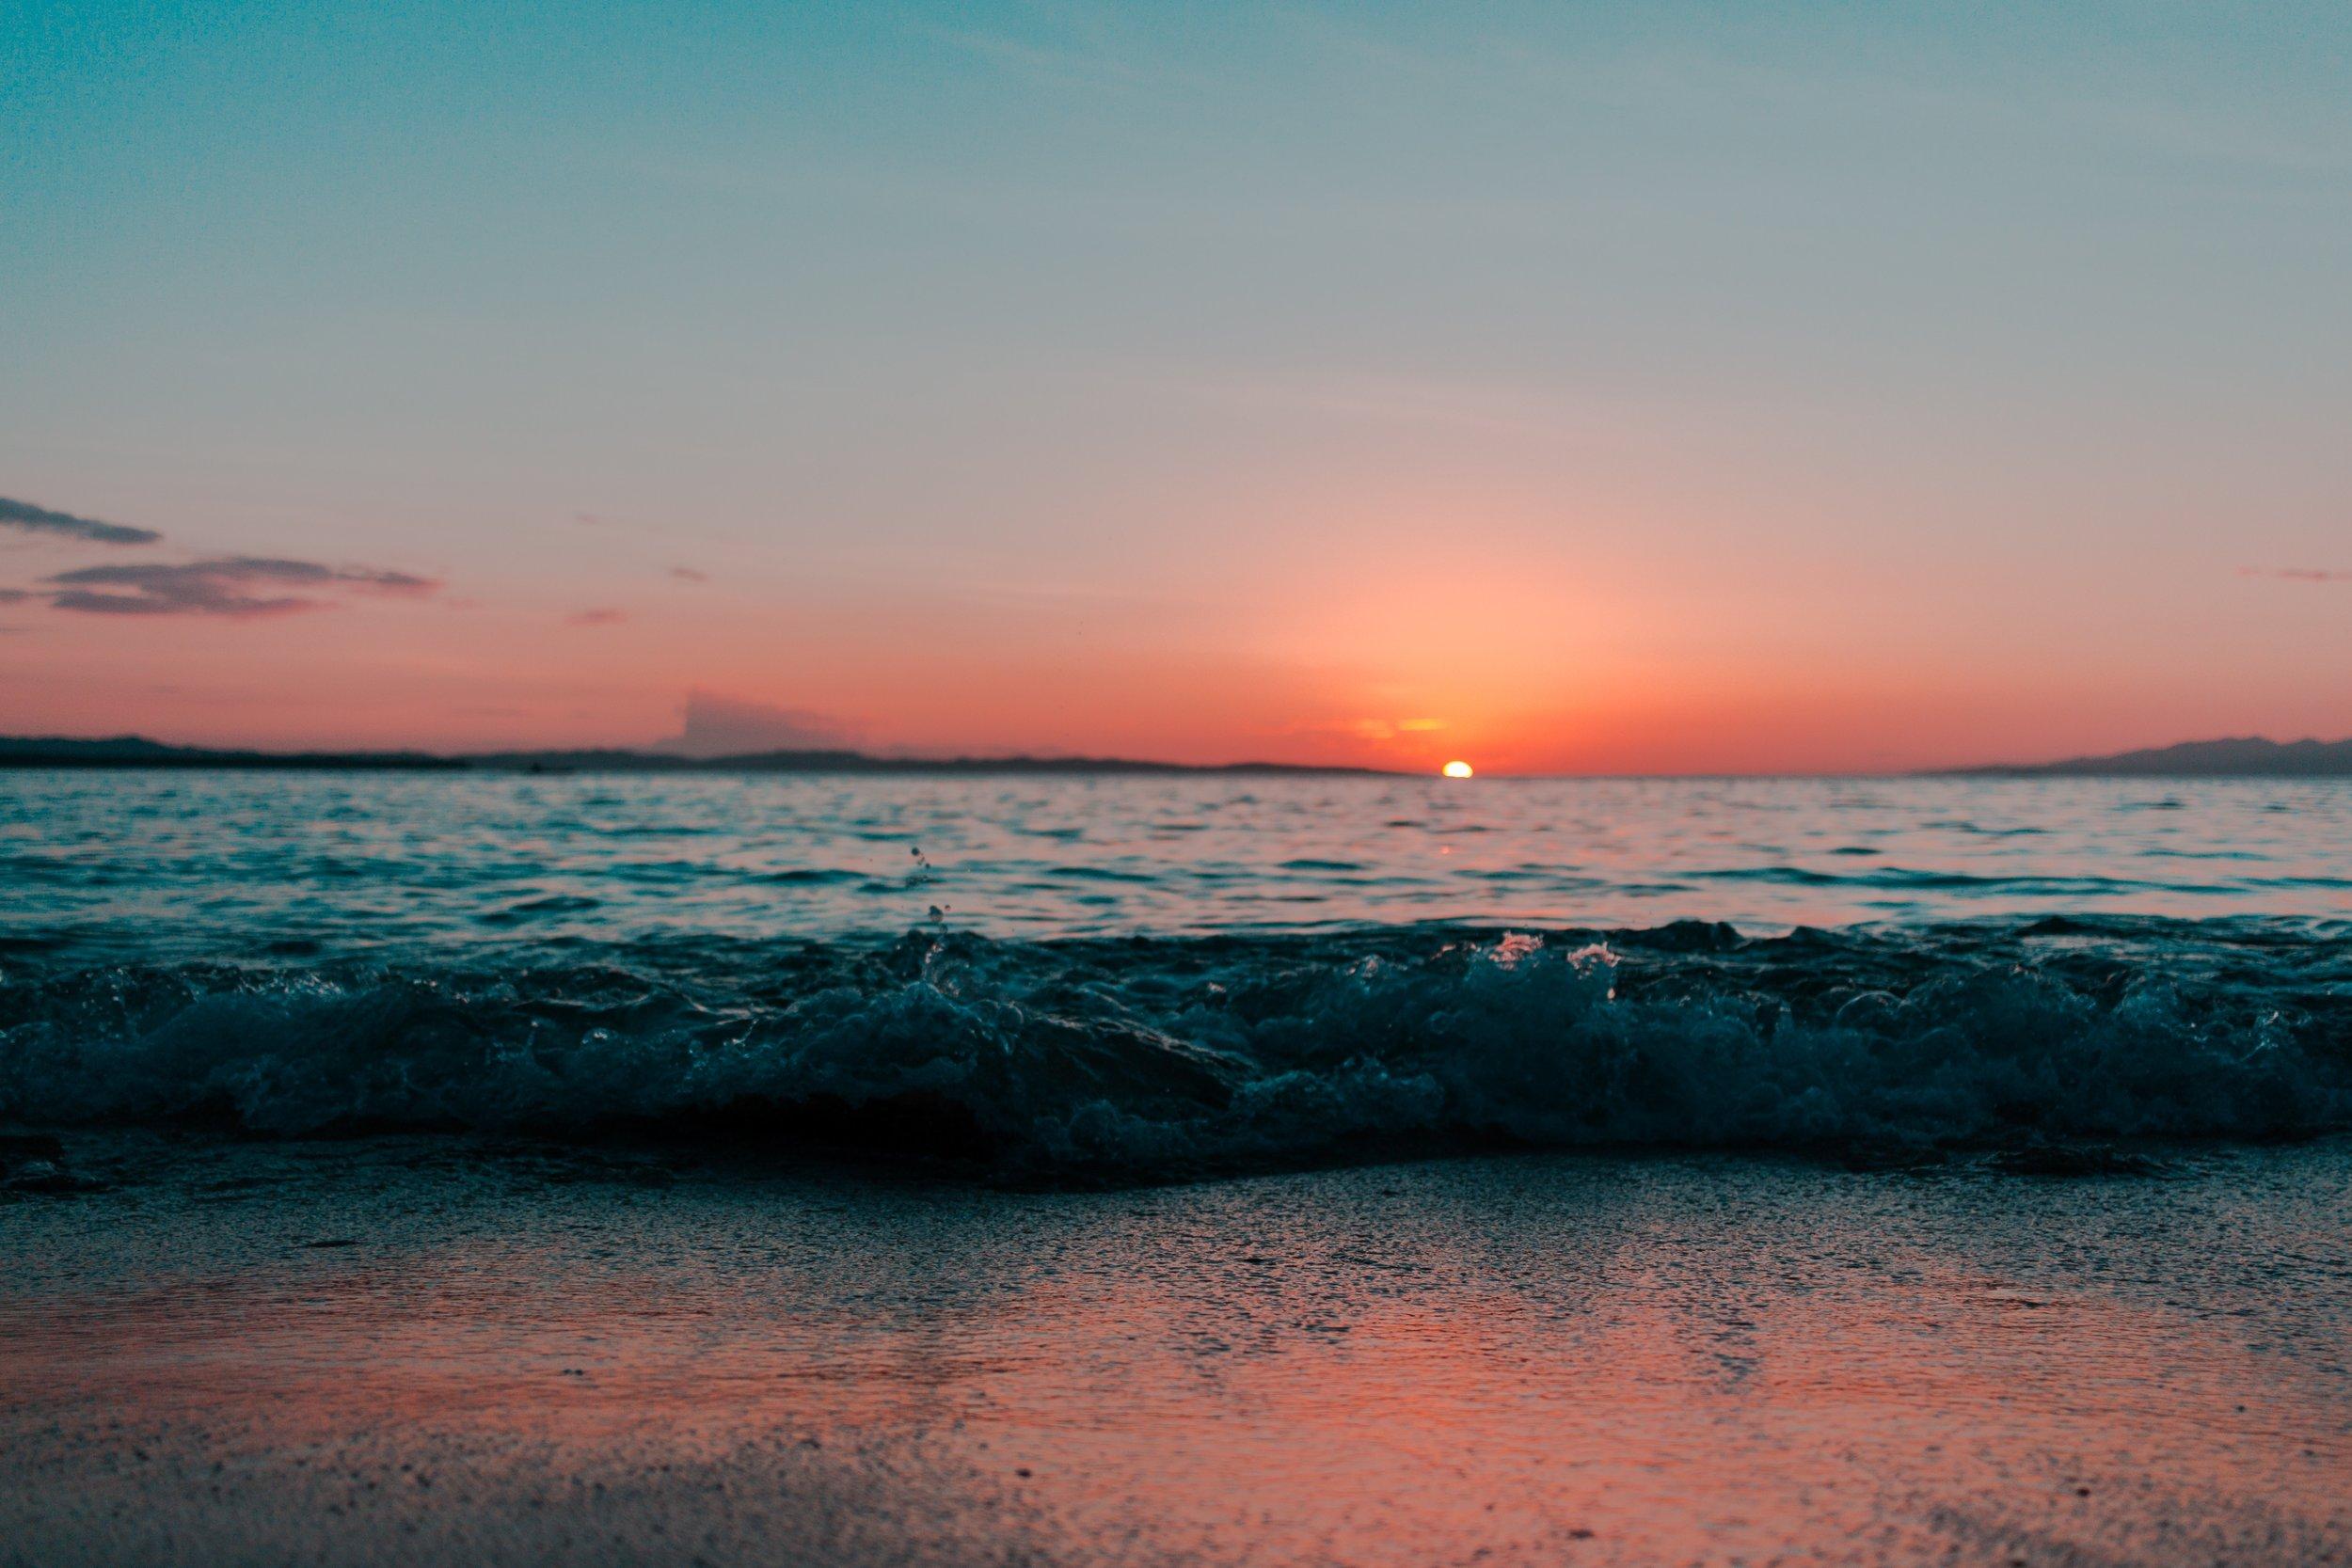 beach-dawn-depth-of-field-1139541.jpg